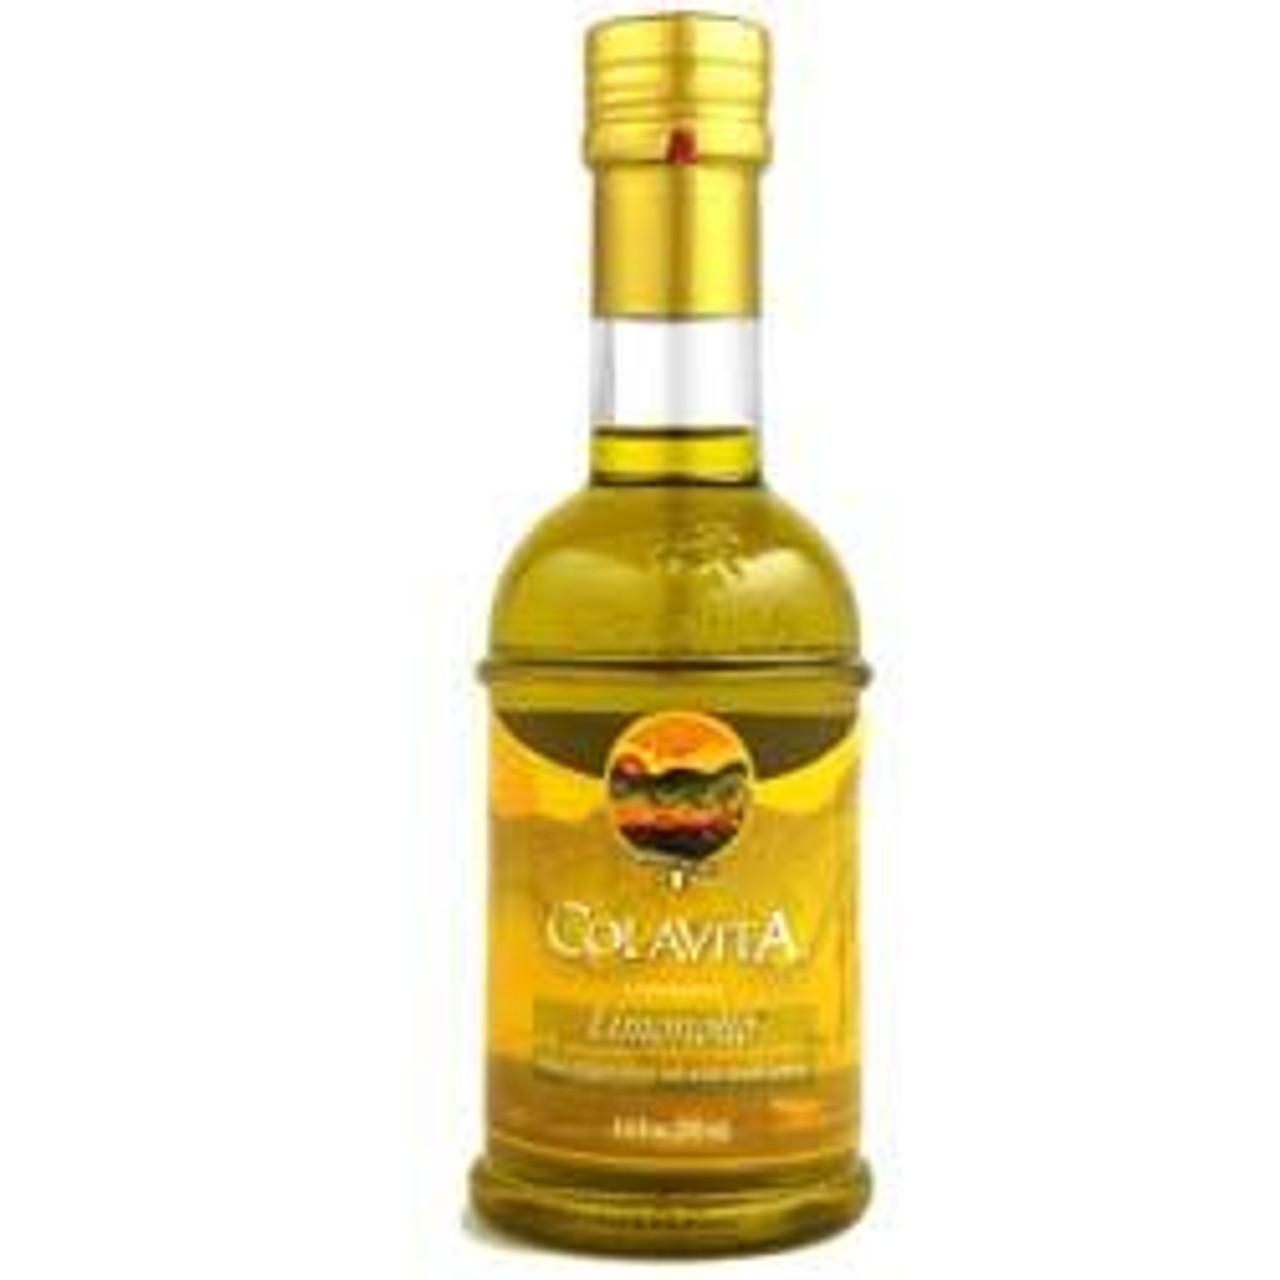 Colavita Extra Virgin Olive Oil infused with lemon essence